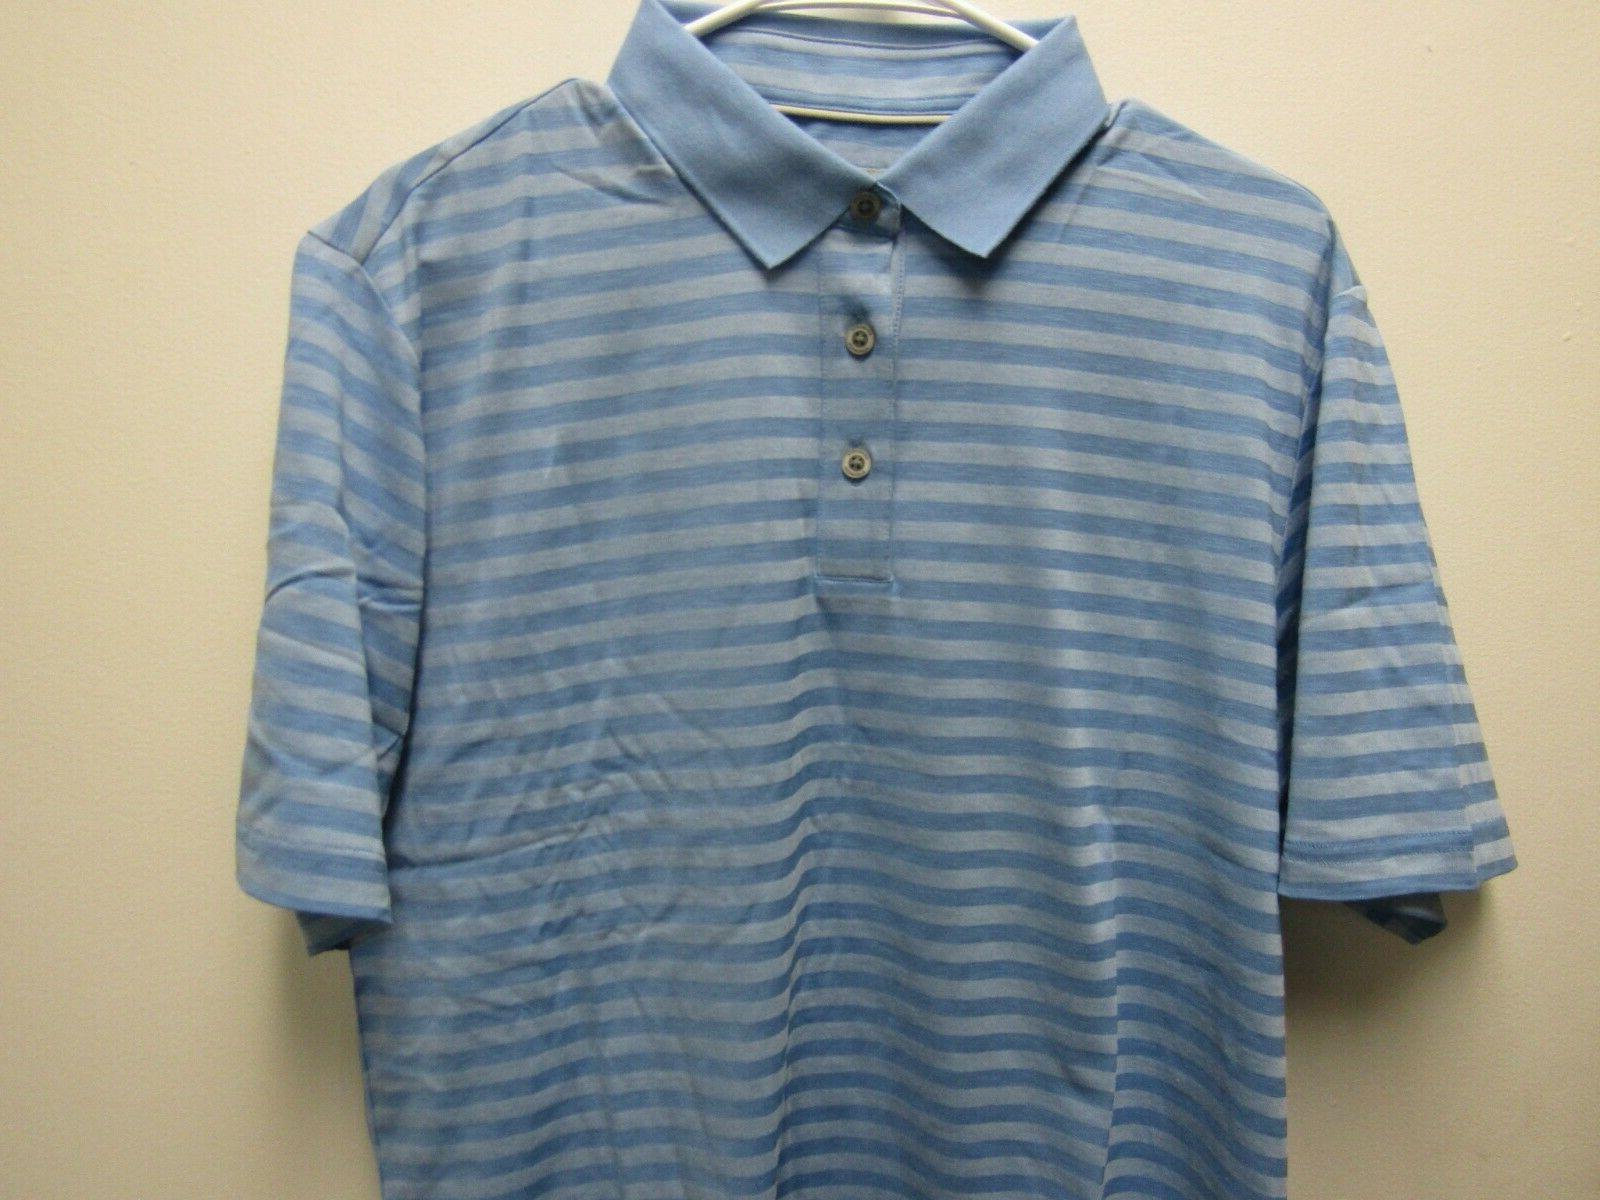 Ashworth Golf Shirt Seaside Size Medium M EZ-TEC 2 AM33173S6 NEW